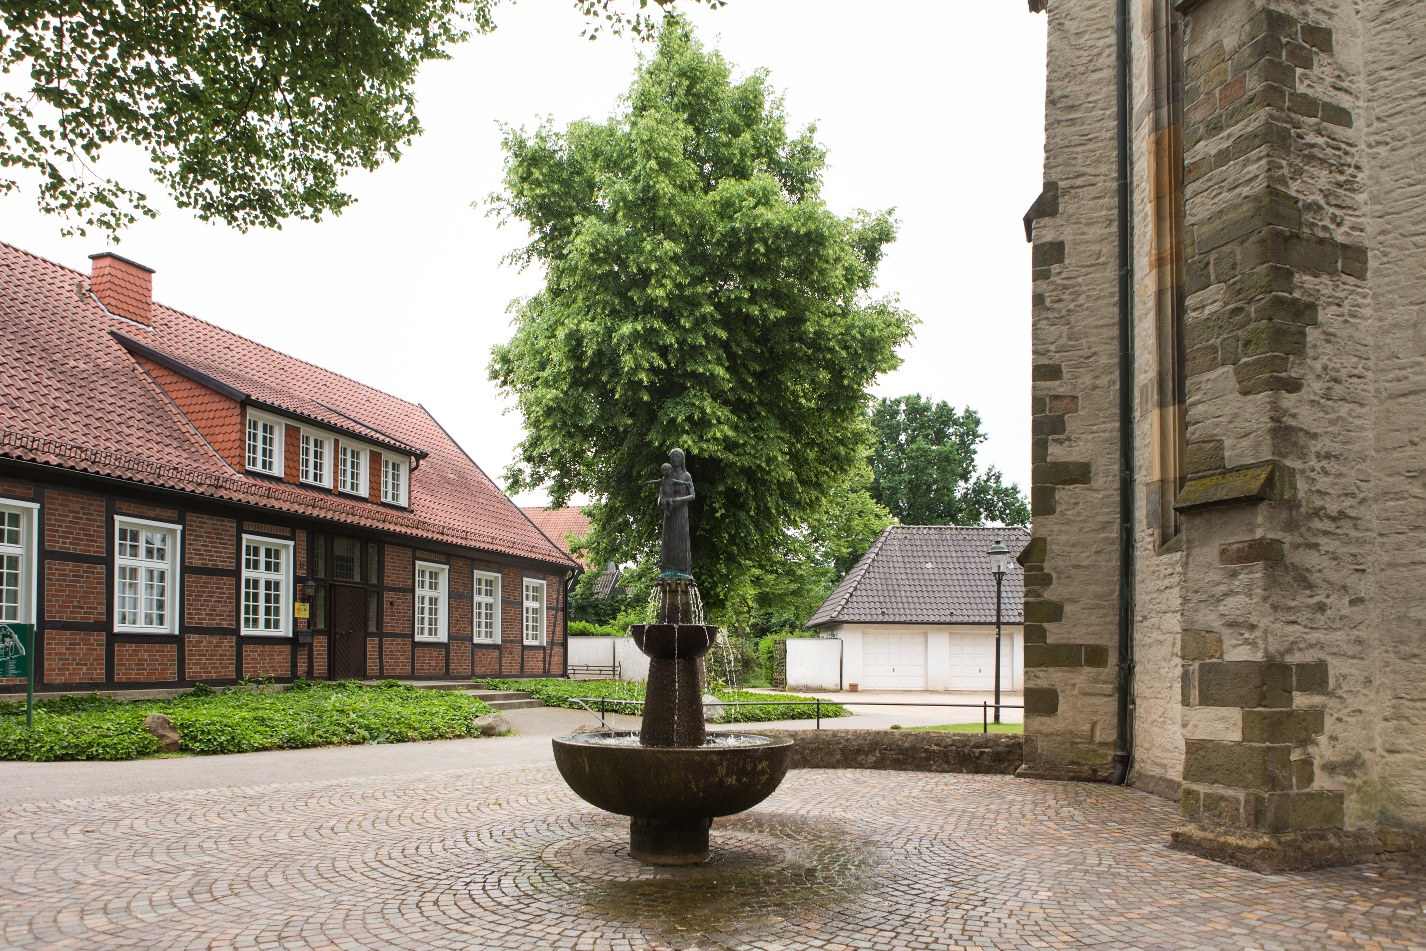 Kirchplatz mit Brunnen